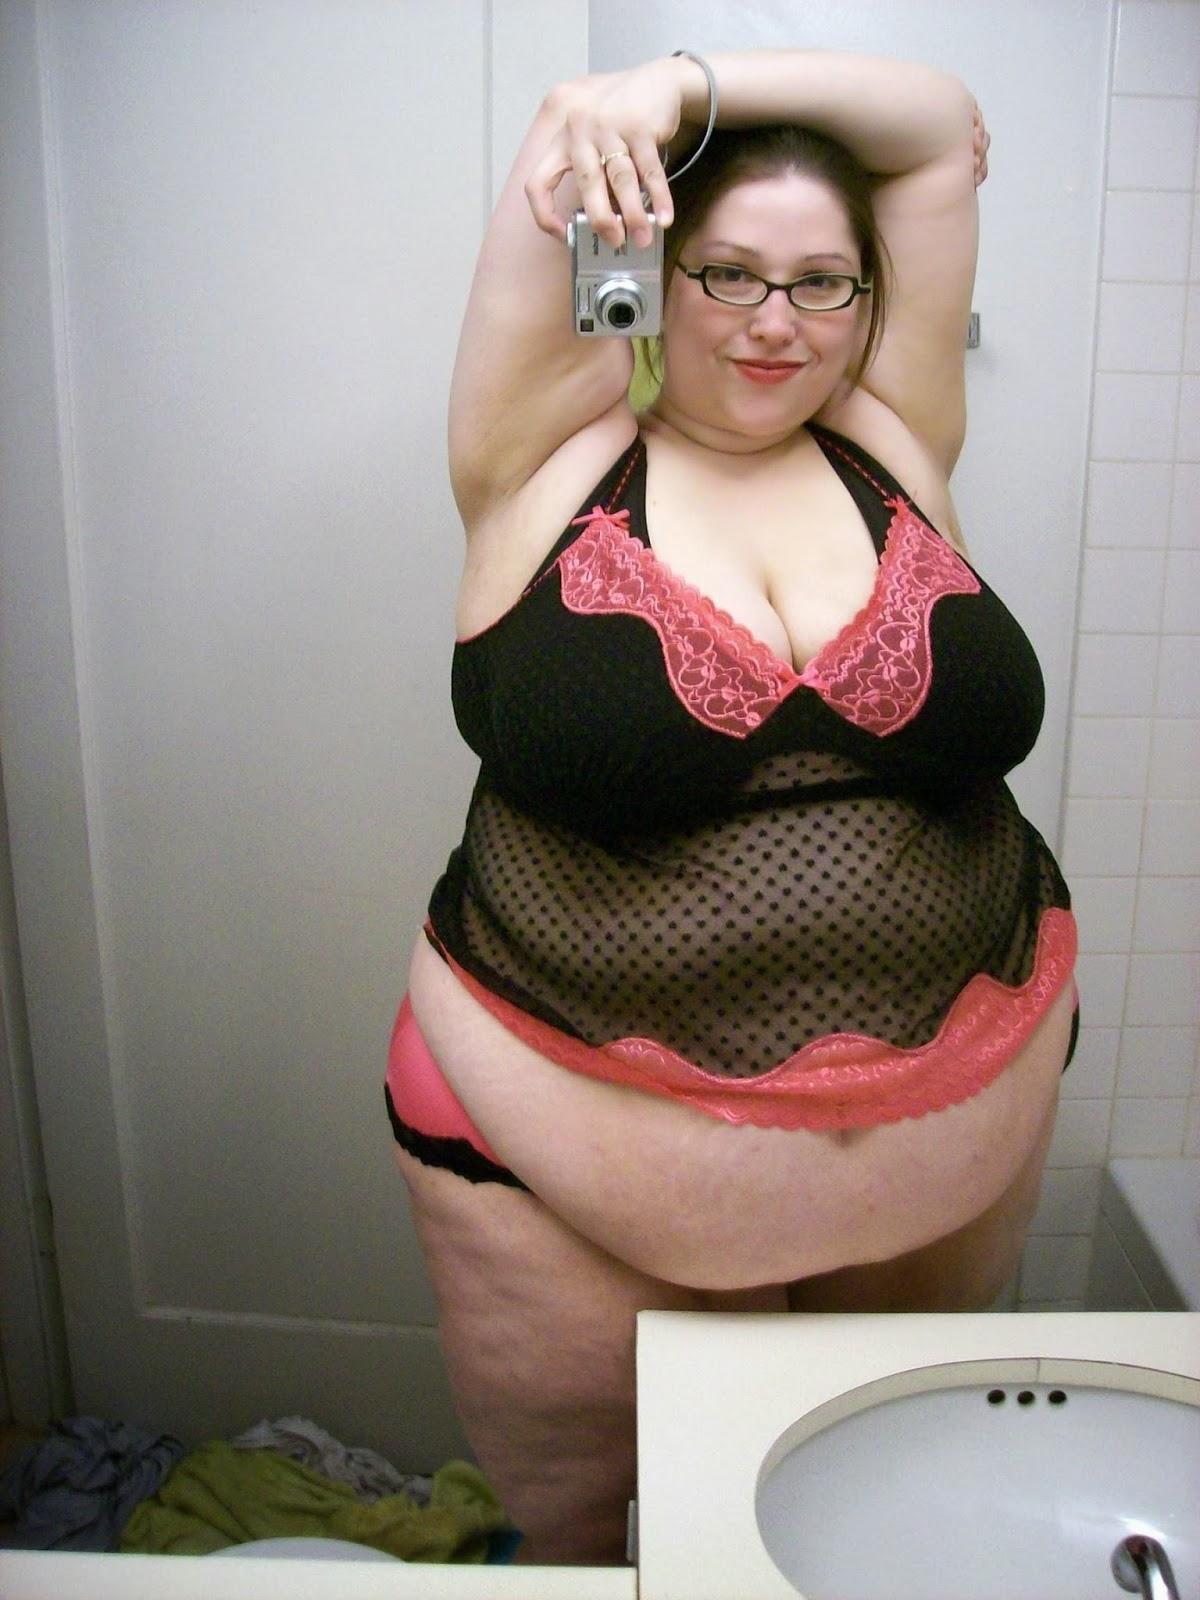 Фото девушка занимается сексом  Naked-Woman.ru